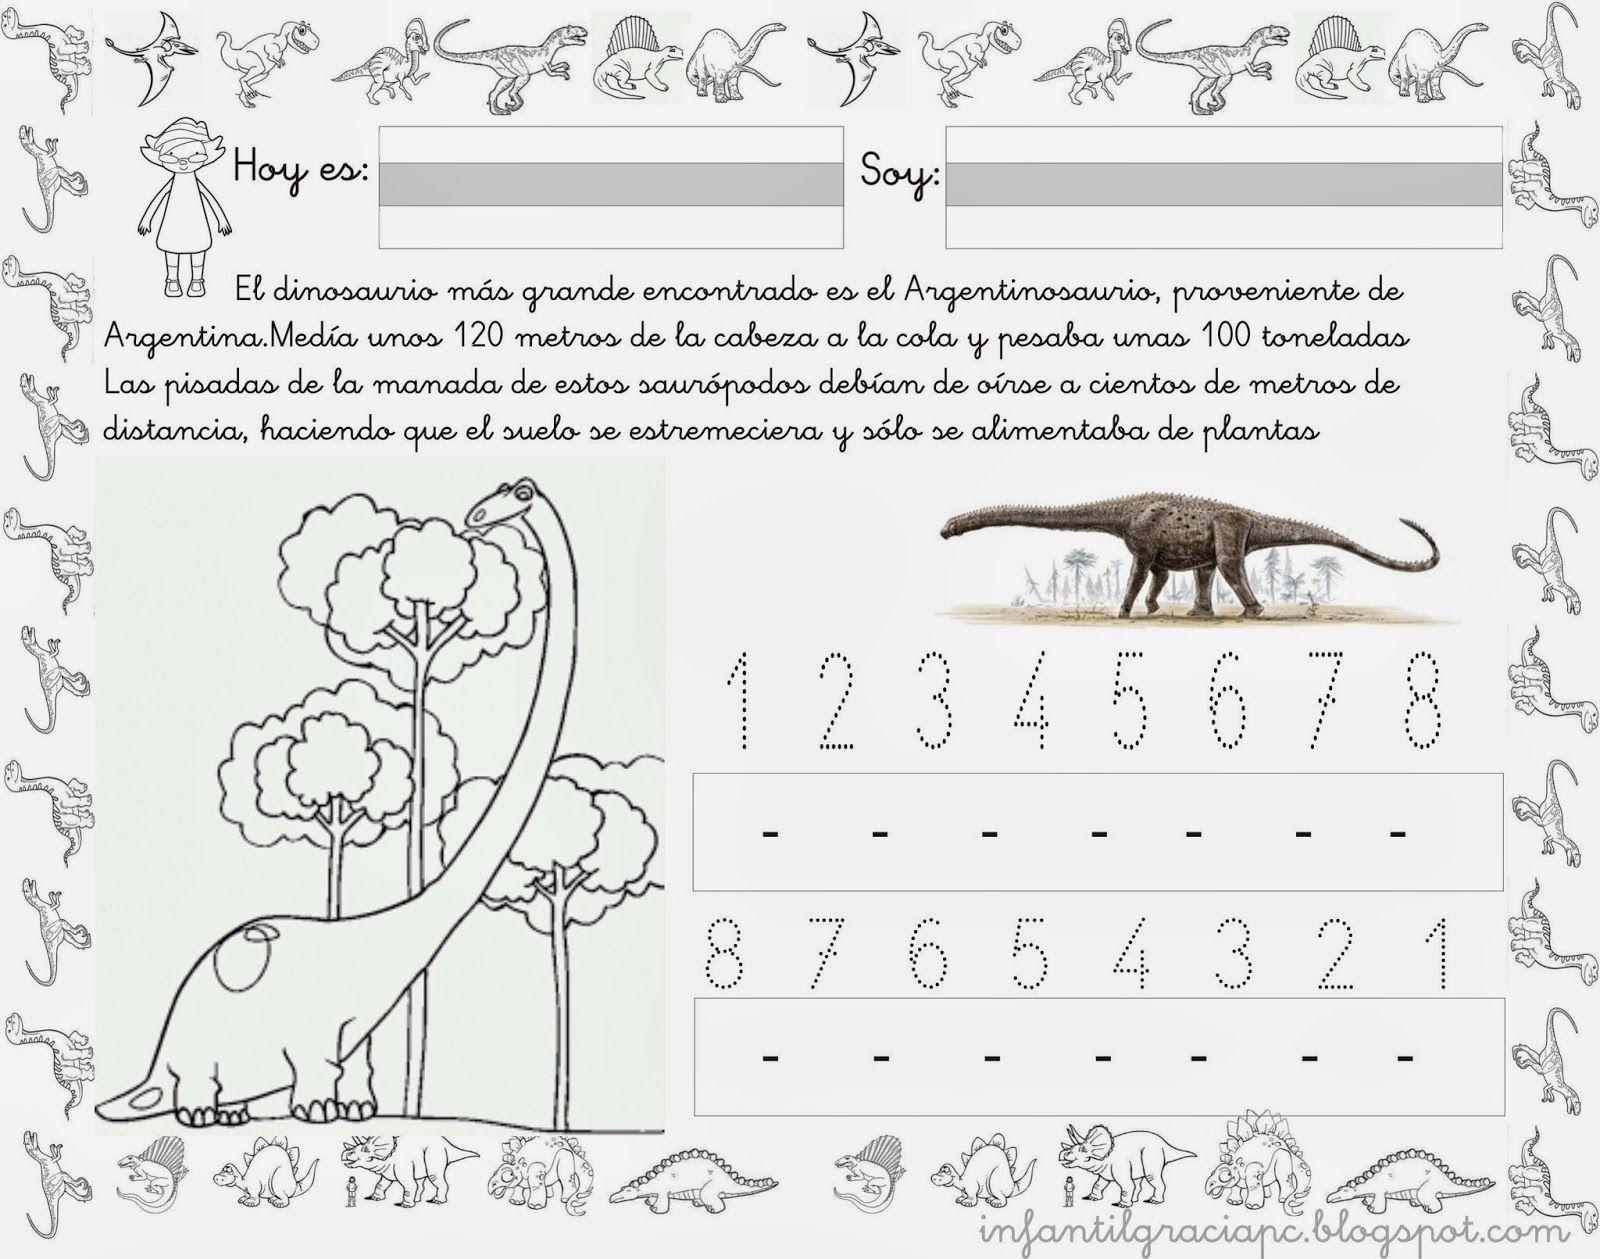 FICHA+ARGENTINOSAURIO++.jpg (1600×1259)